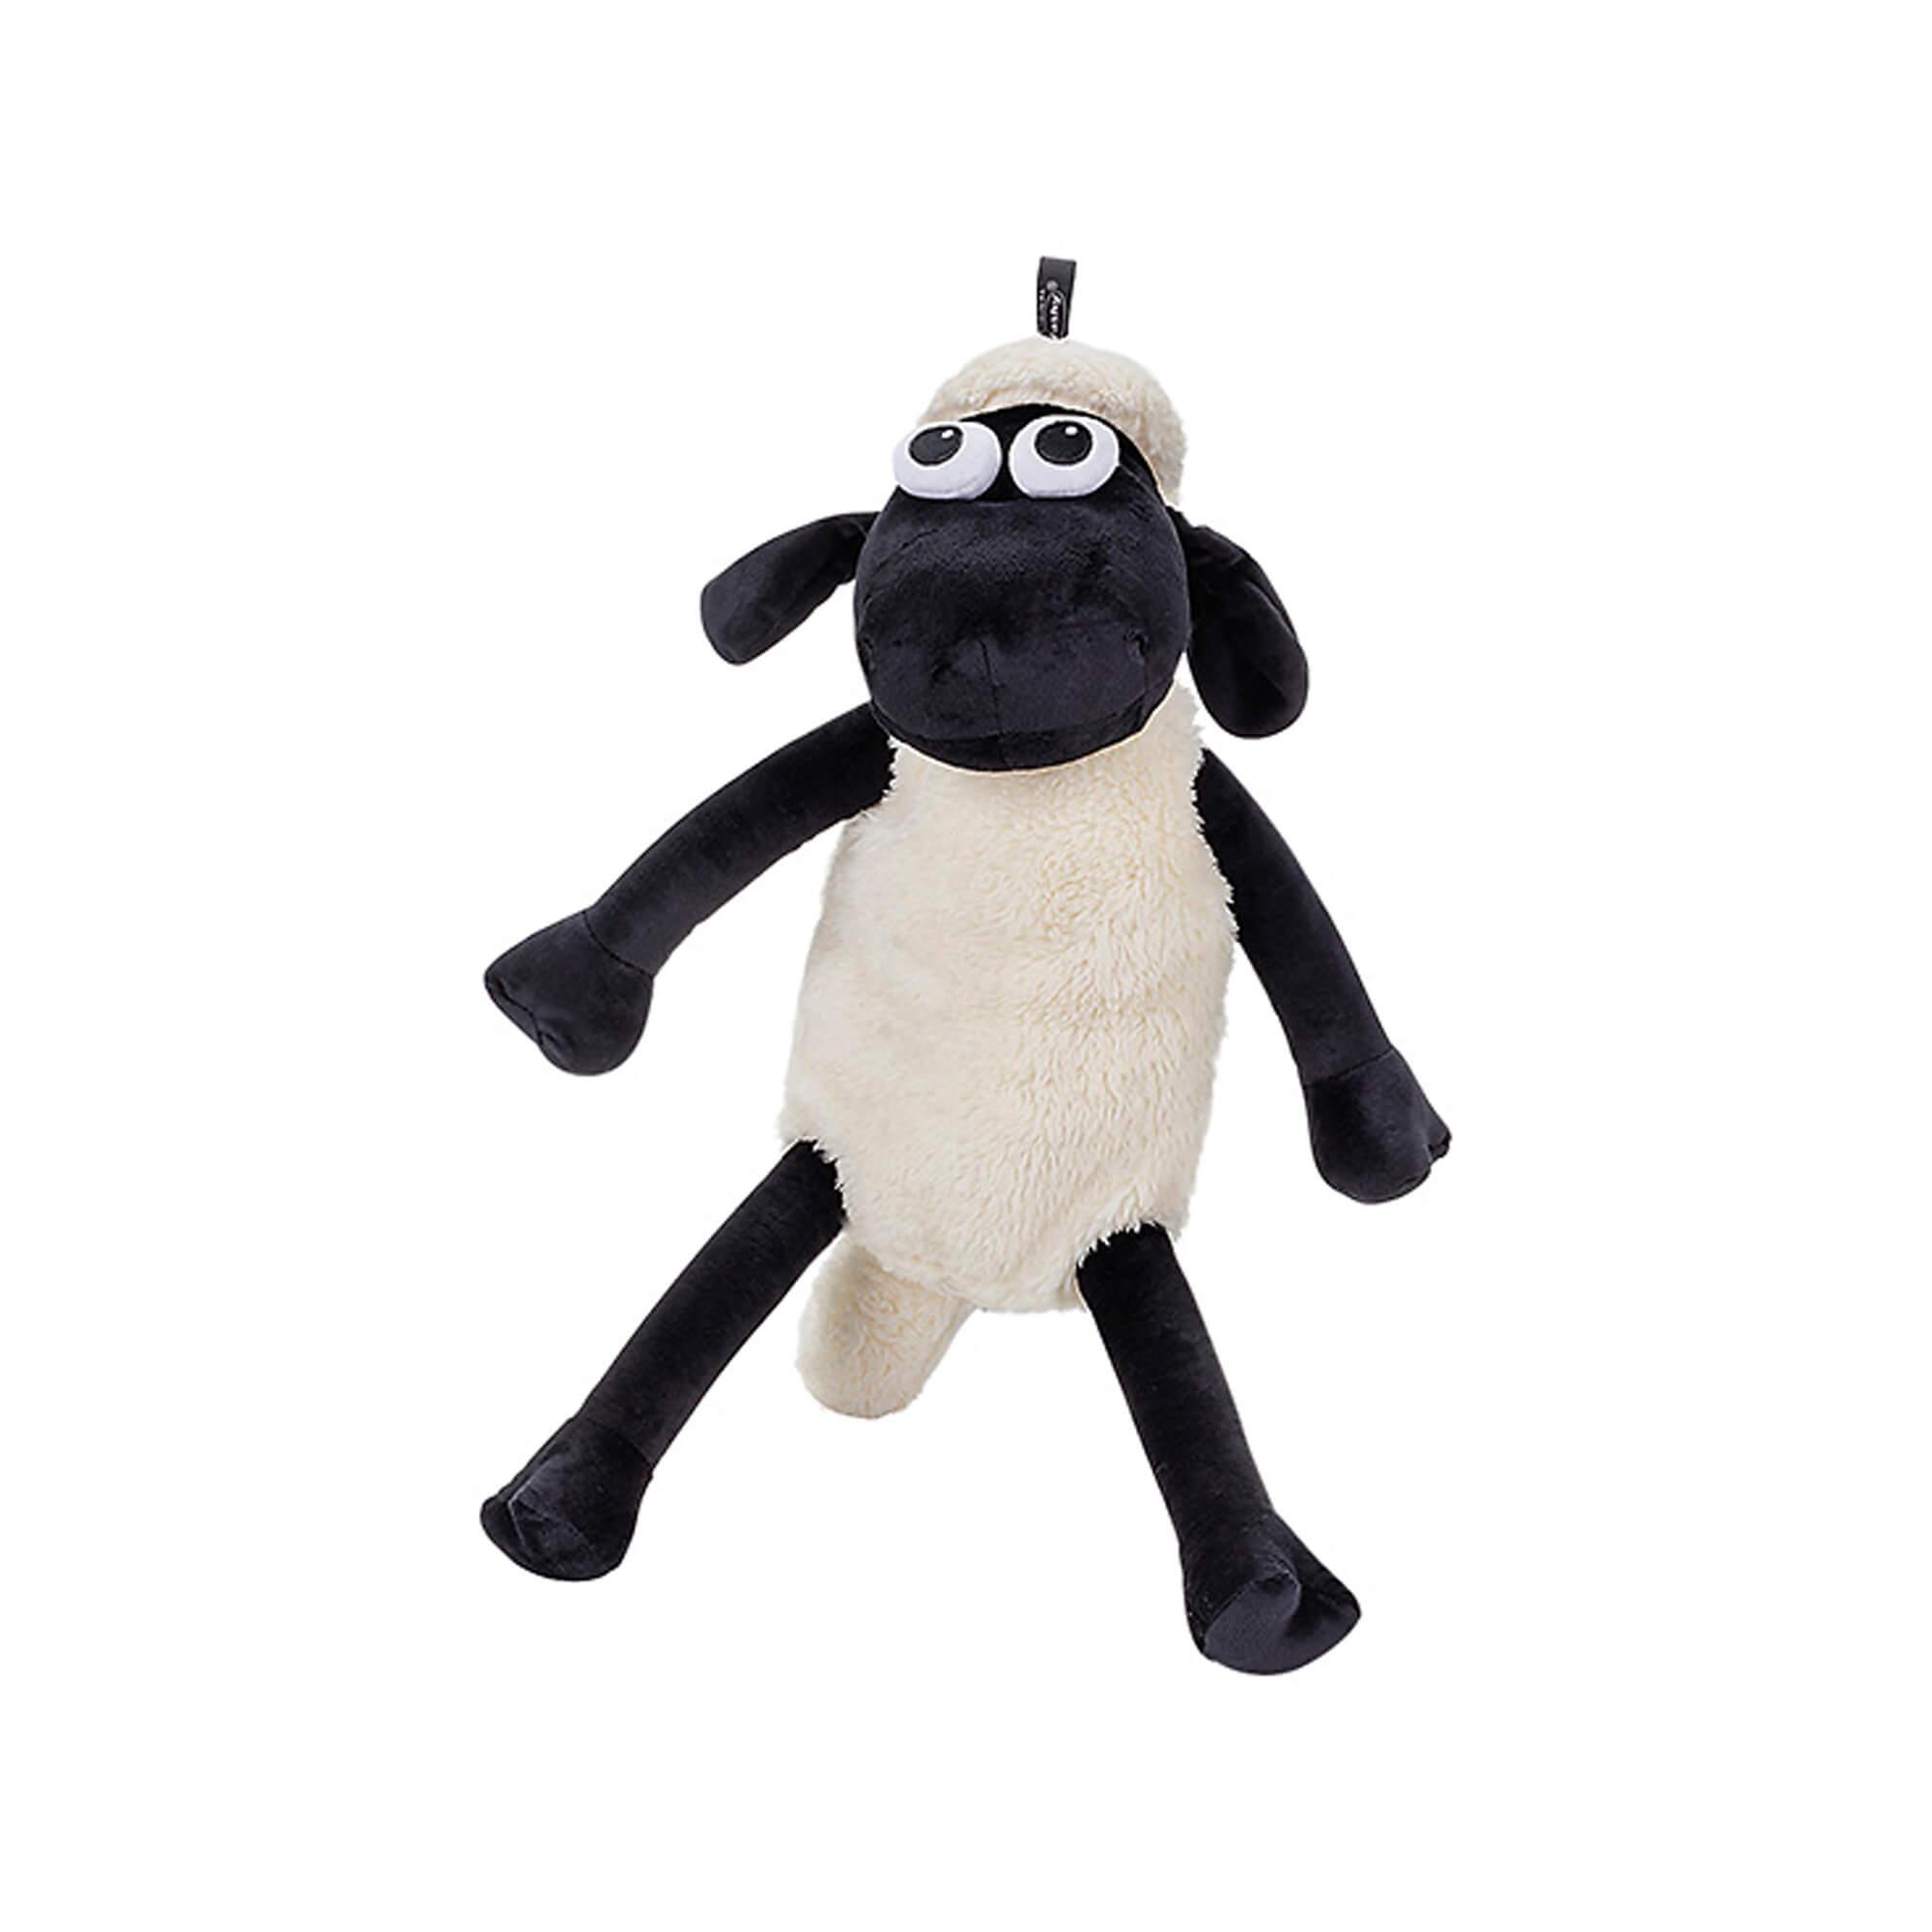 Fashy Kuschel Wärmflasche Shaun das Schaf